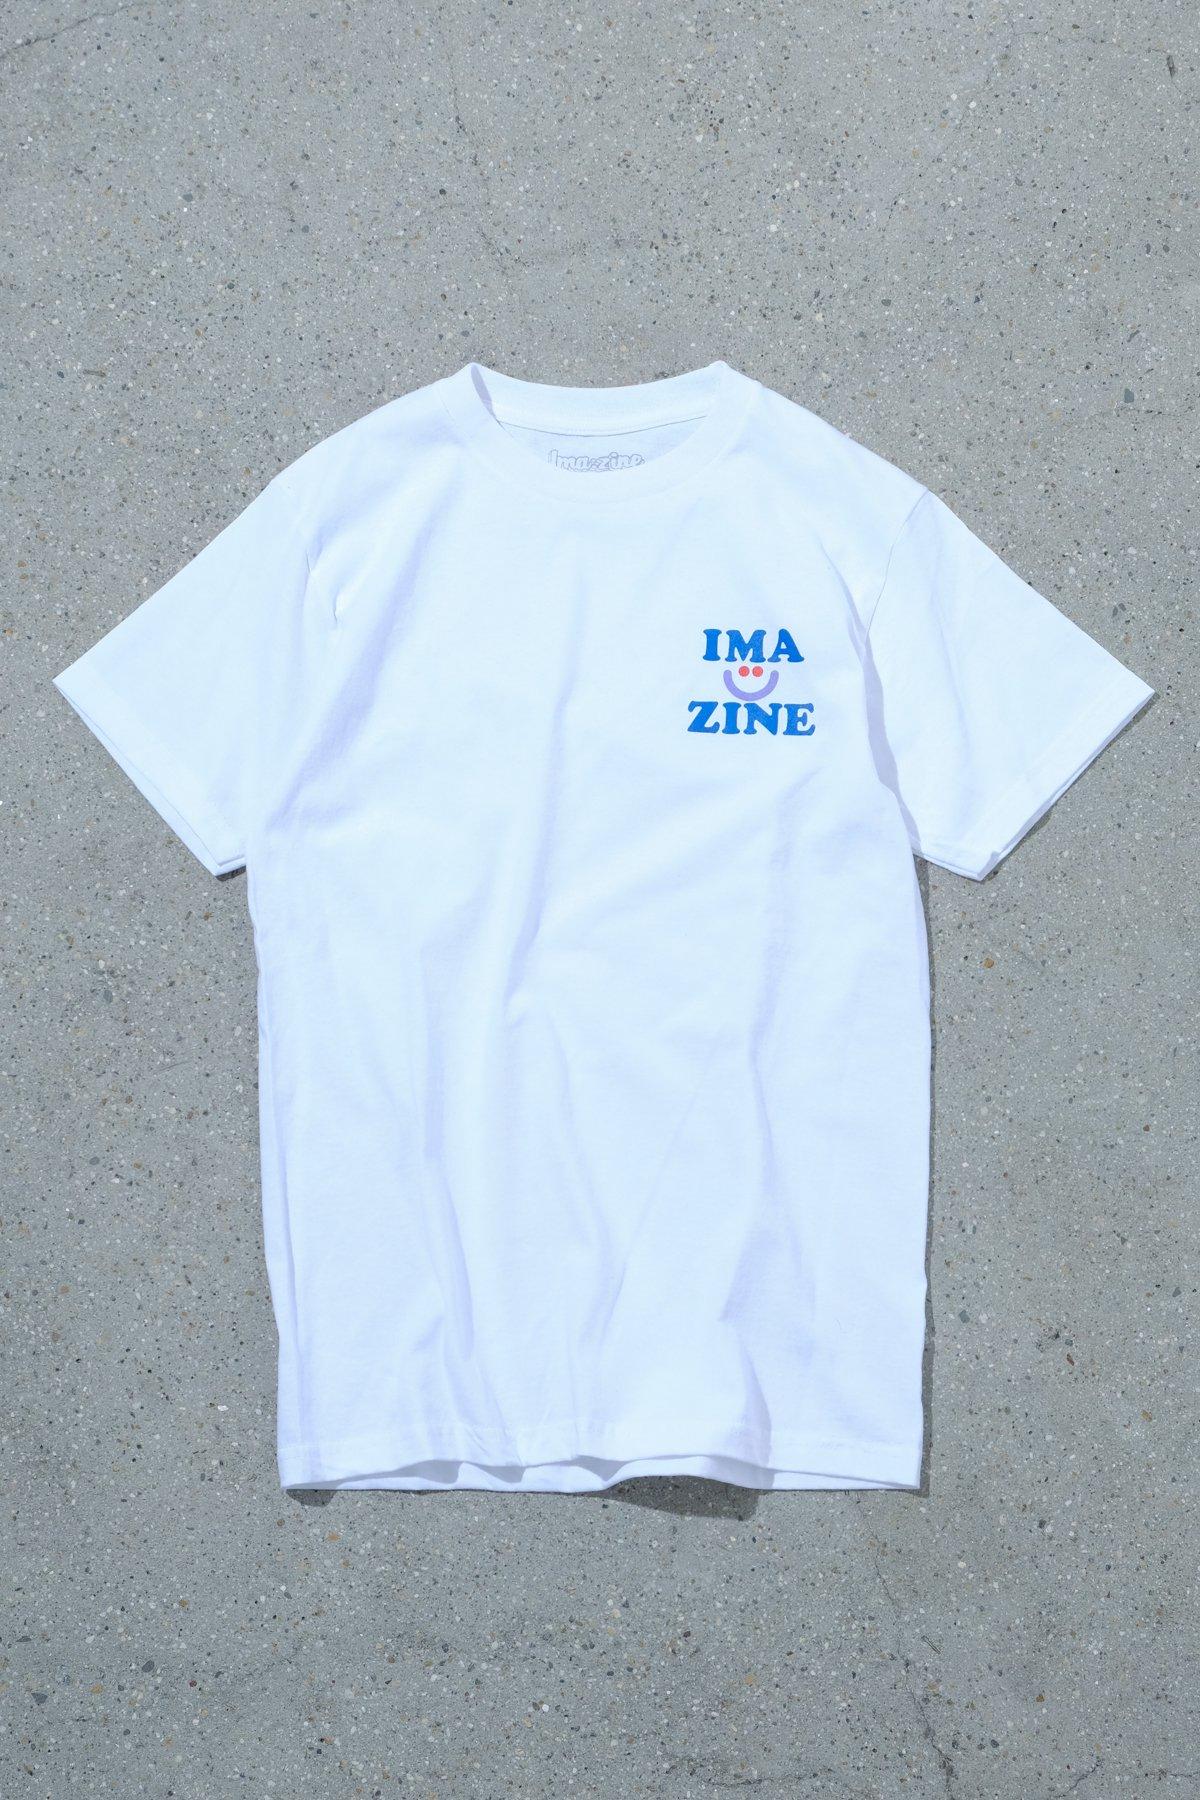 aimi odawara x IMA:ZINE / LOGO TEE